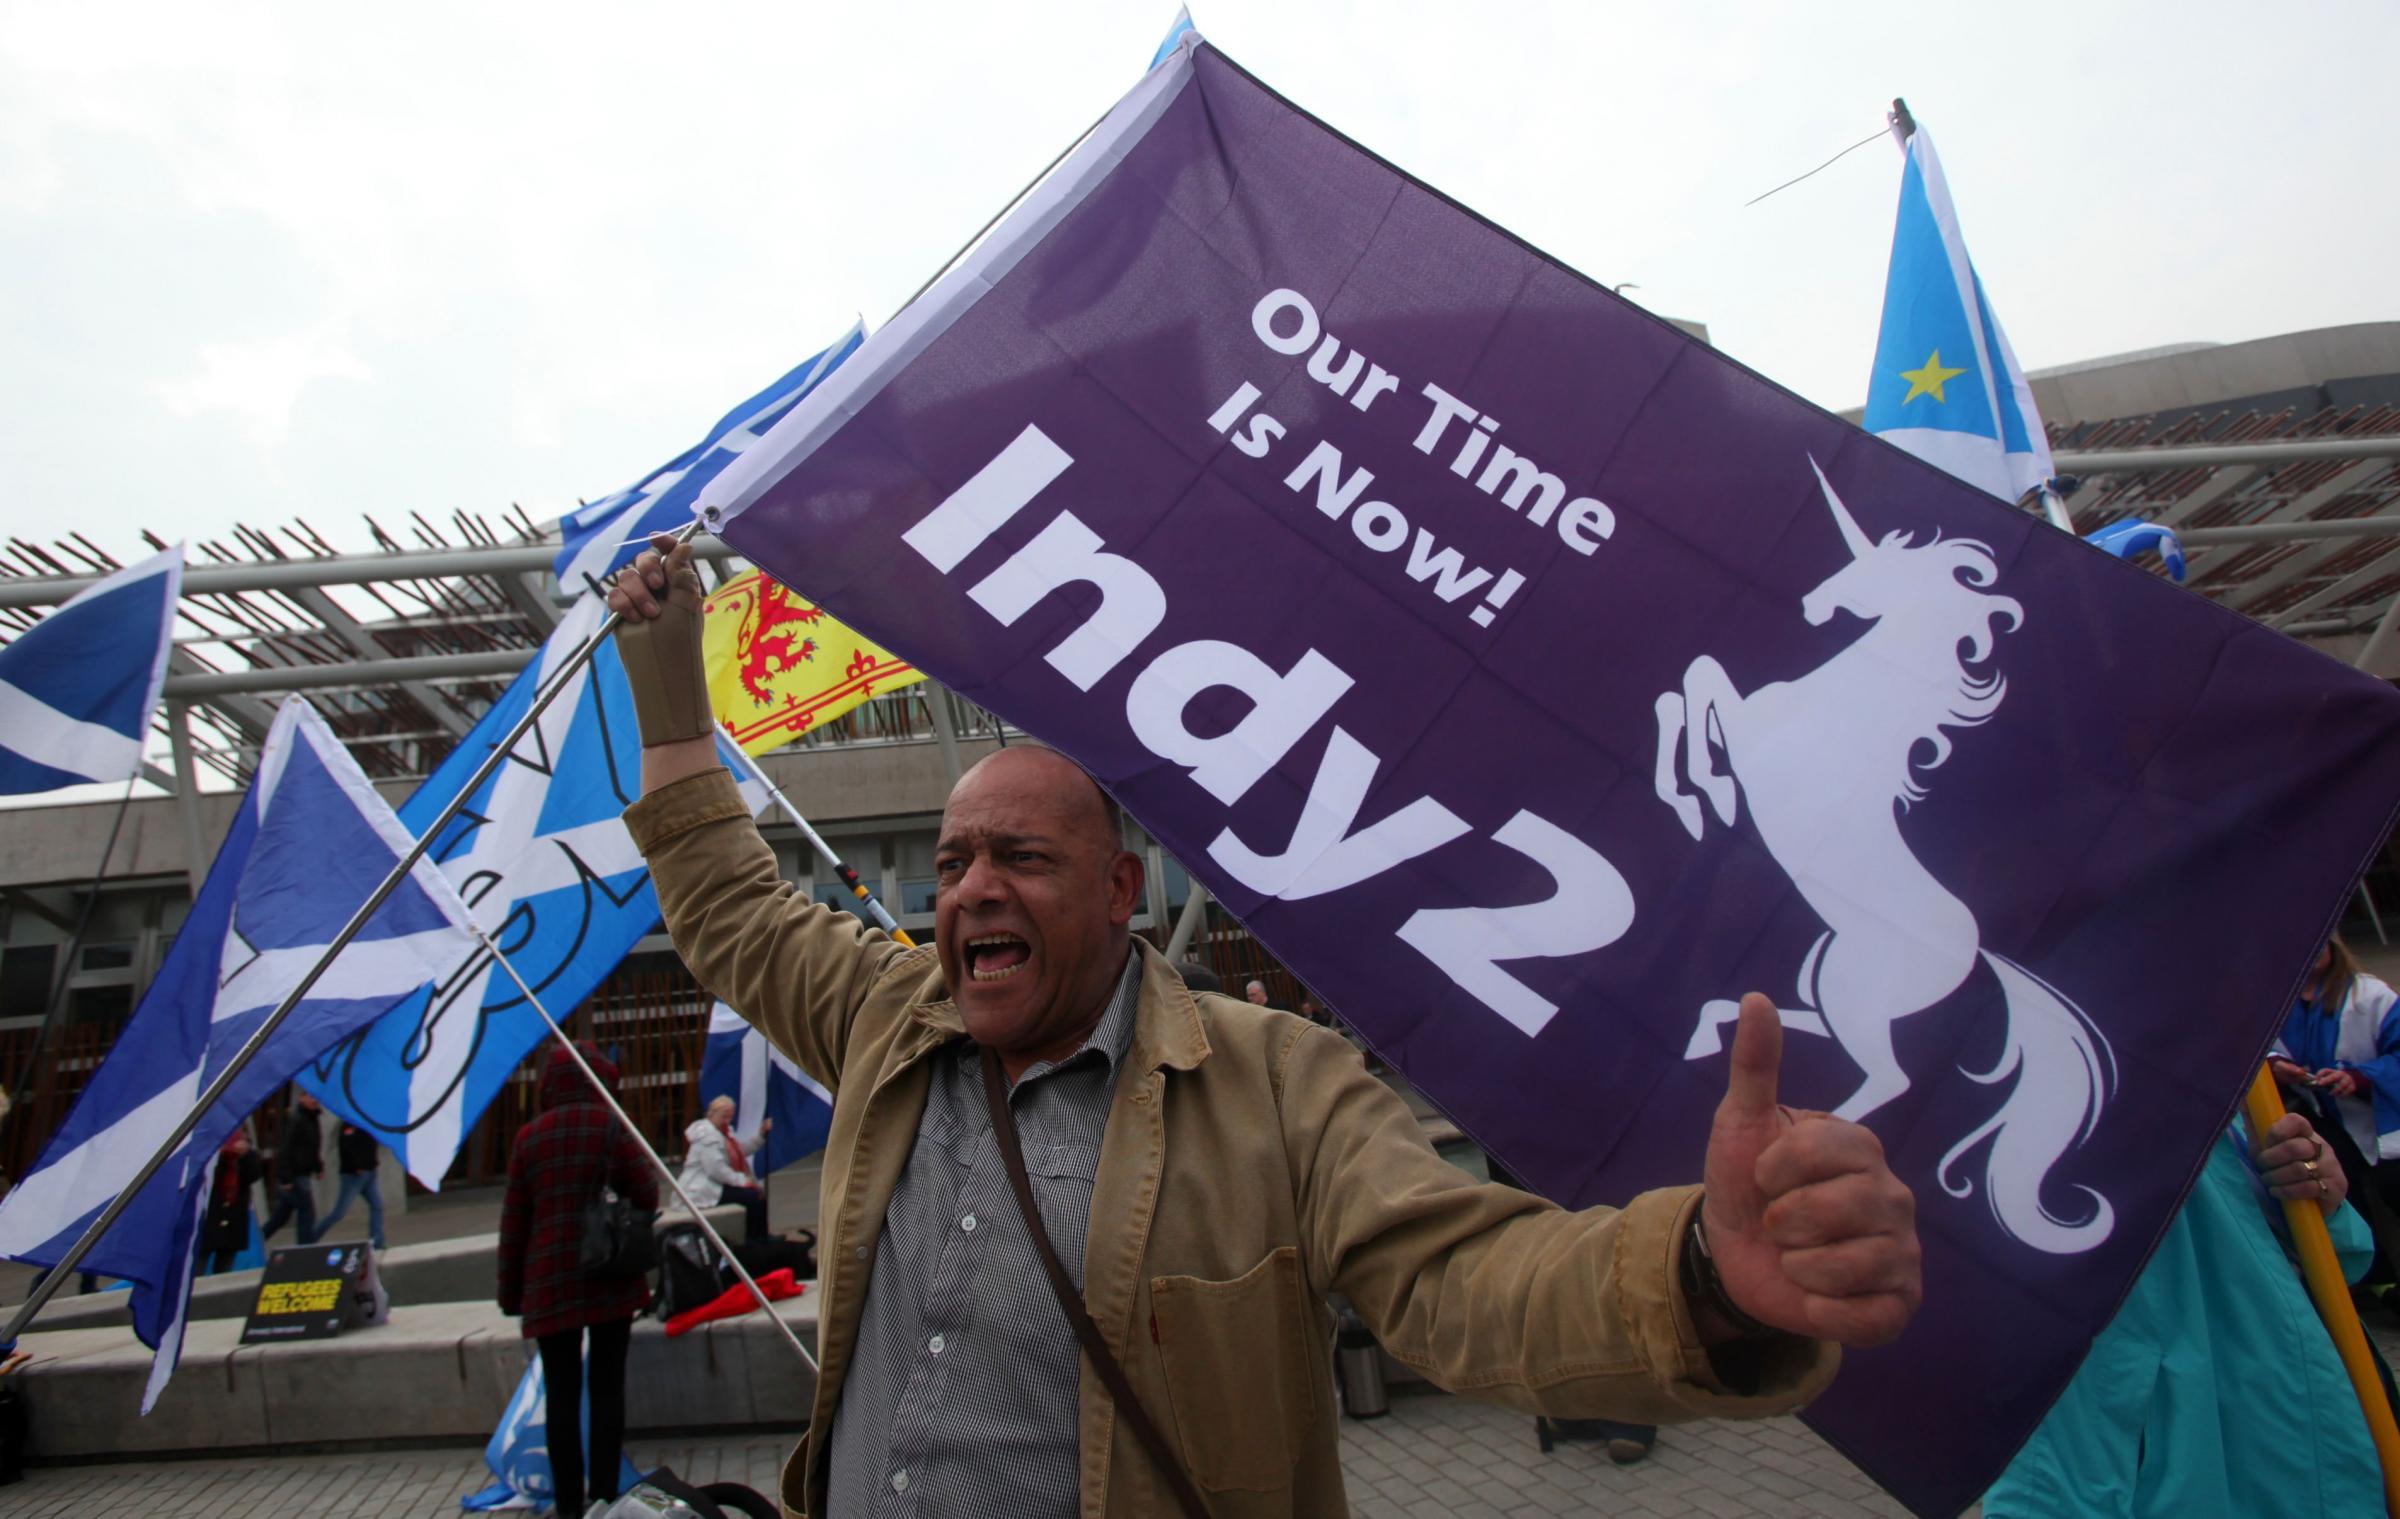 Think tank warns Boris Johnson over denying Scotland indyref2